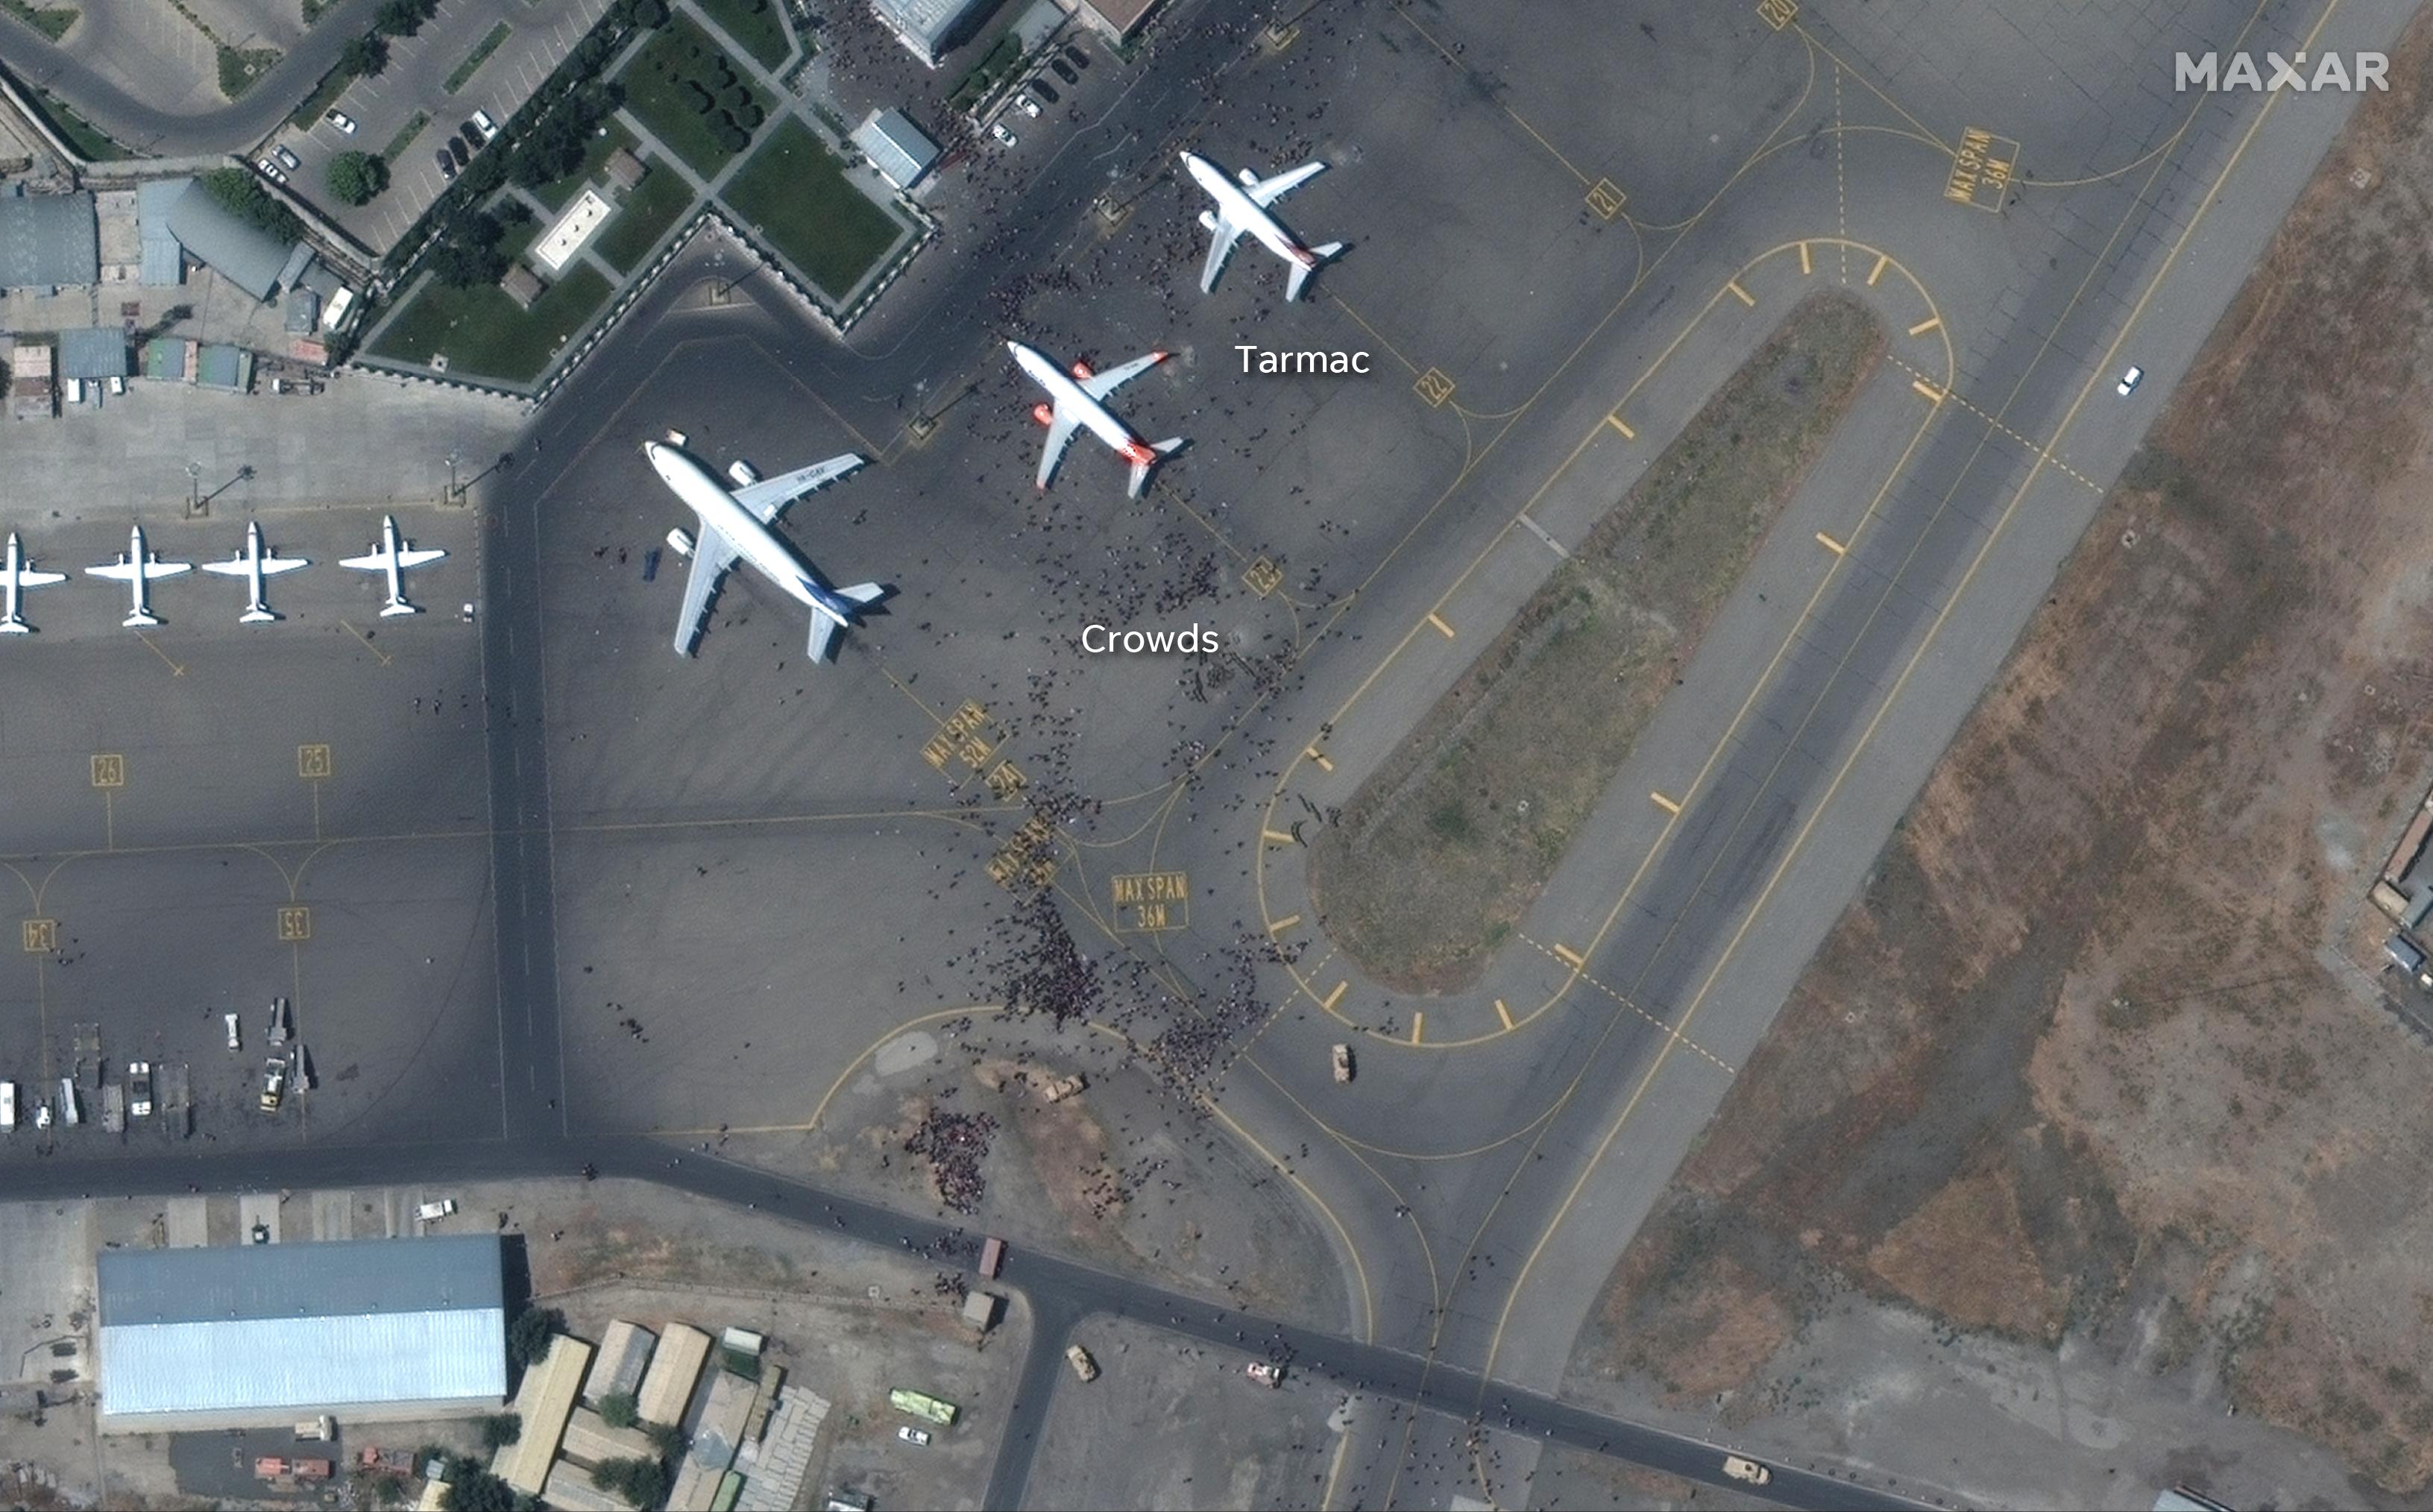 Crowds on the tarmac of Hamid Karzai International Airport Aug. 16, 2021.